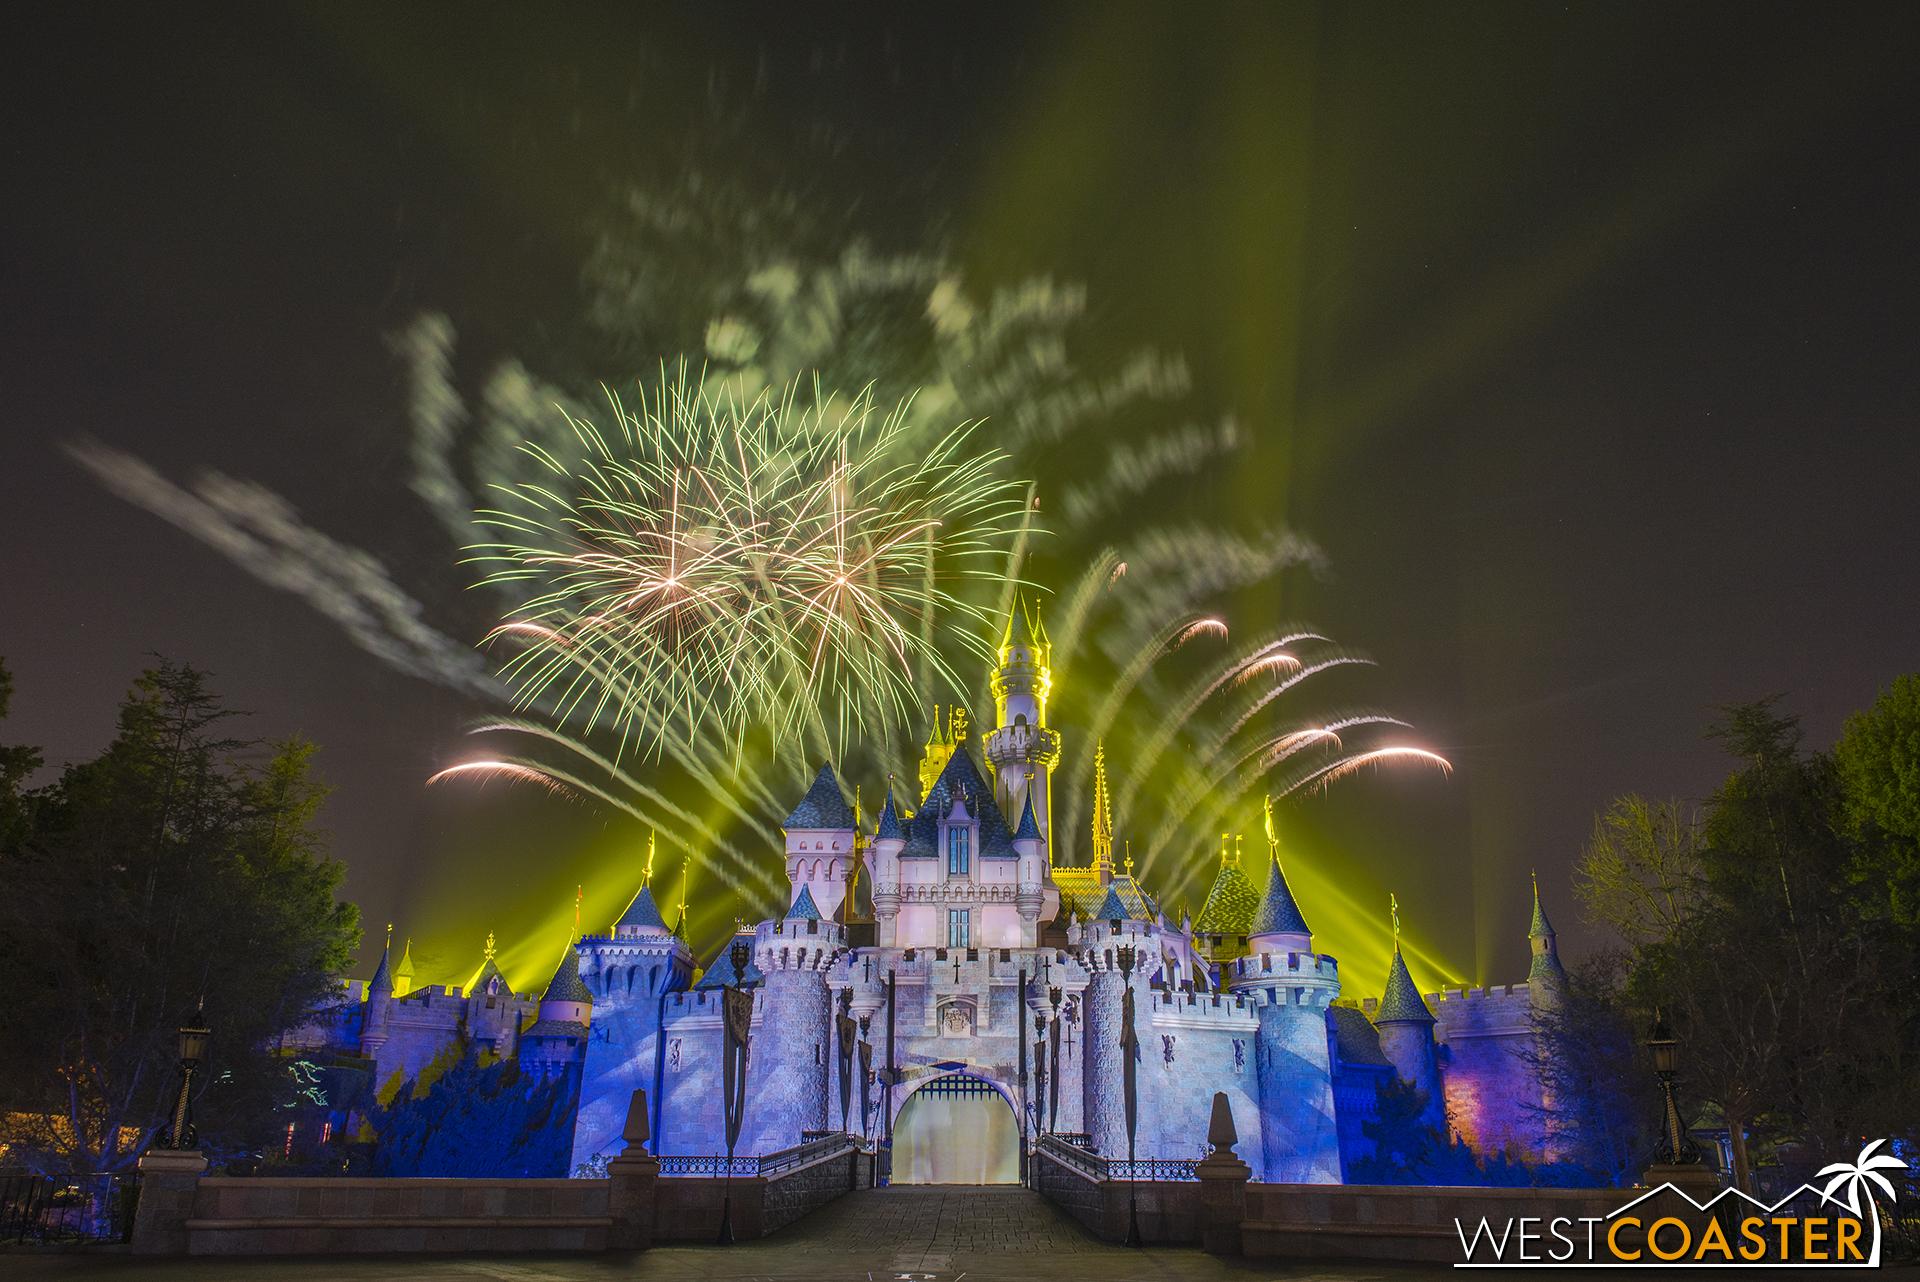 Plenty of pyrotechnics light up the sky, and Buzz Light year streaks across Sleeping Beauty Castle.